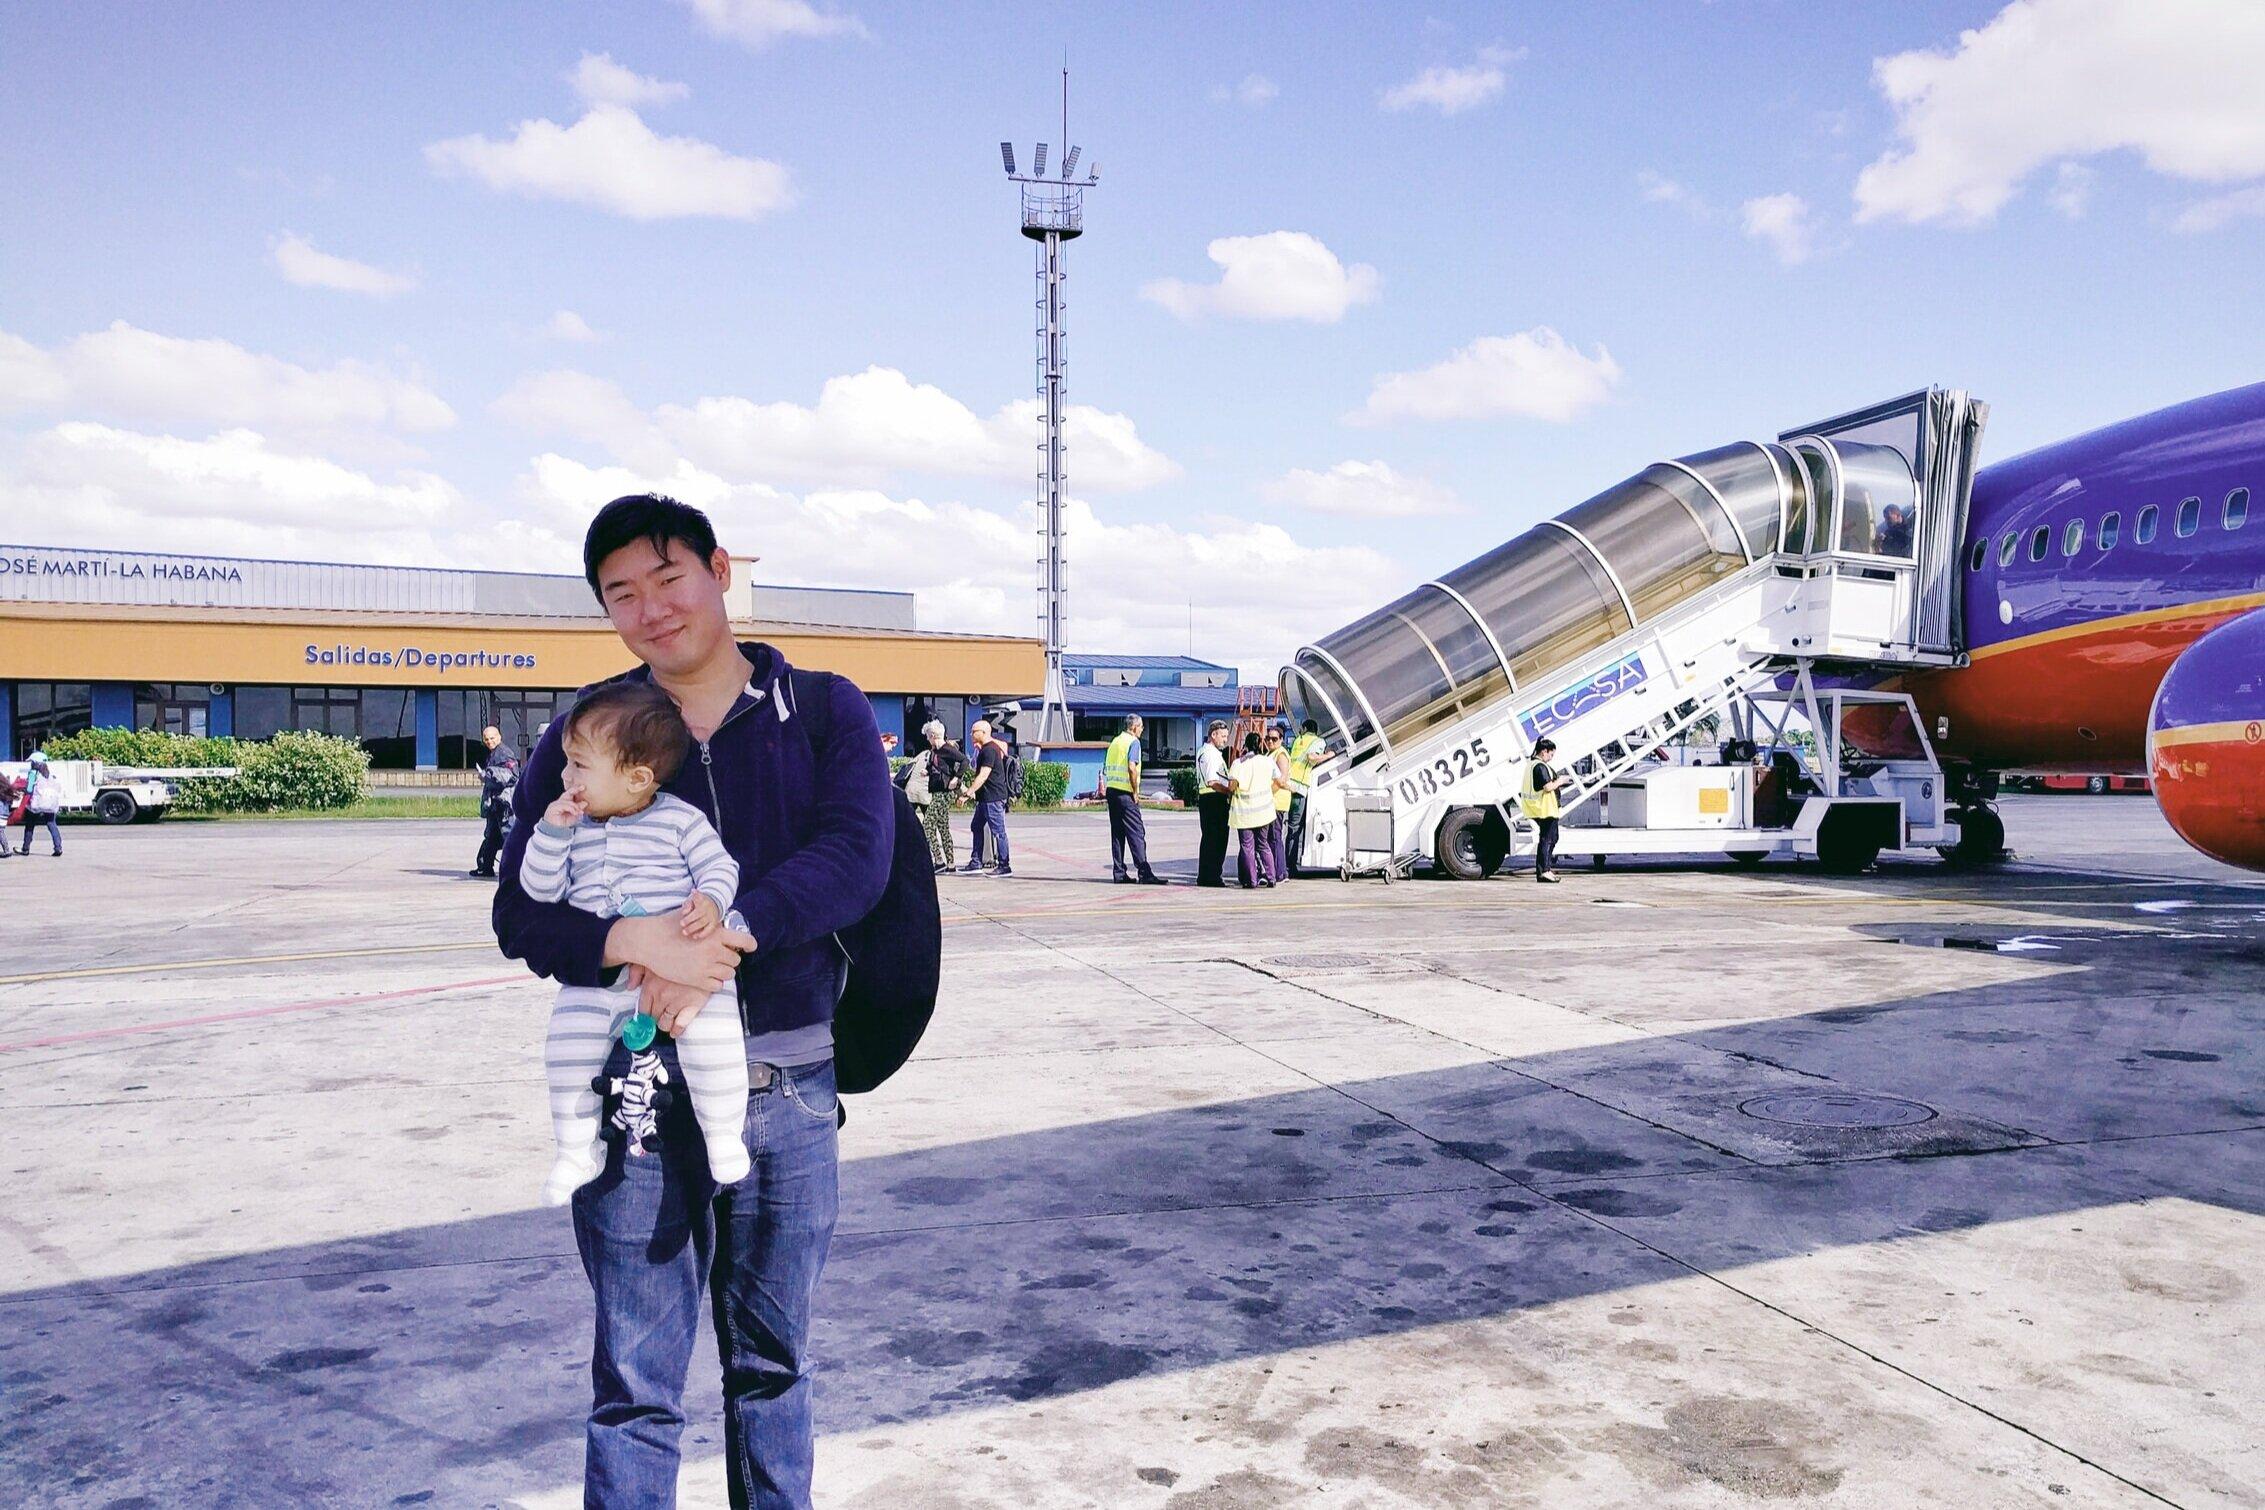 Steven and Elden (10 months old) after landing in Cuba